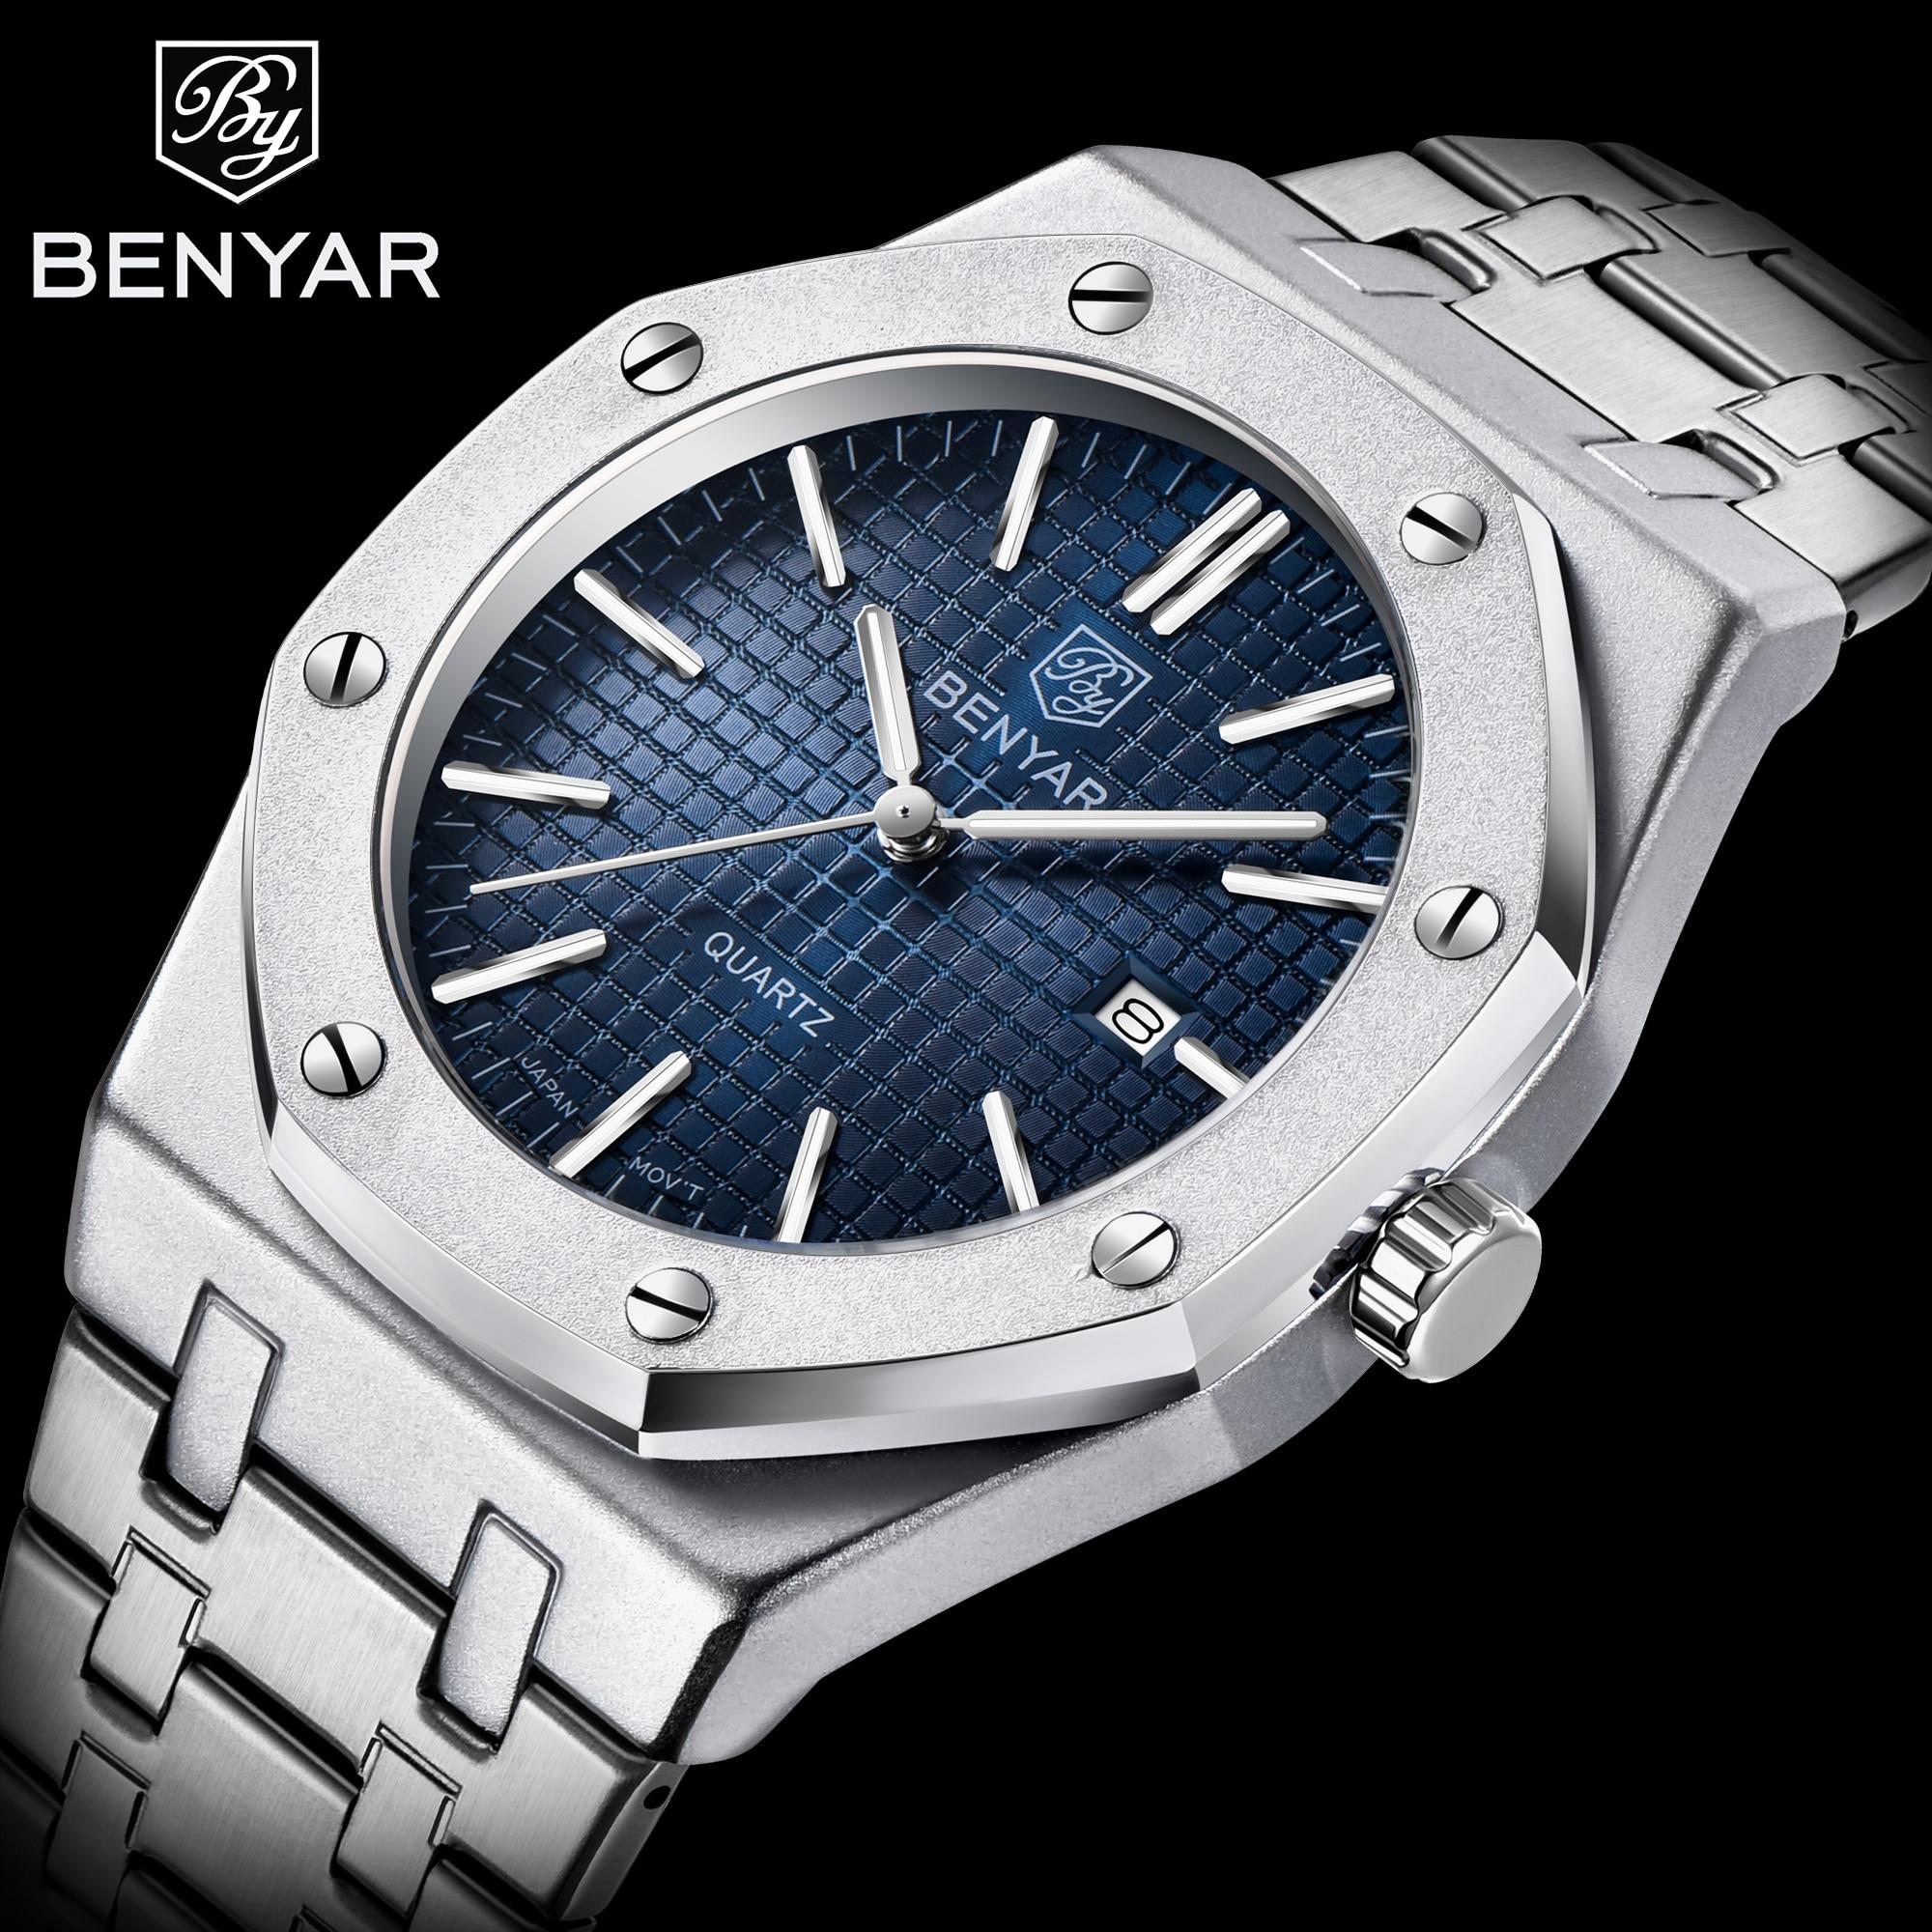 BENYAR Top Luxury Brand Quartz Watch Men 2020 New Style Silver Blue Stainless Steel Band Military Wa